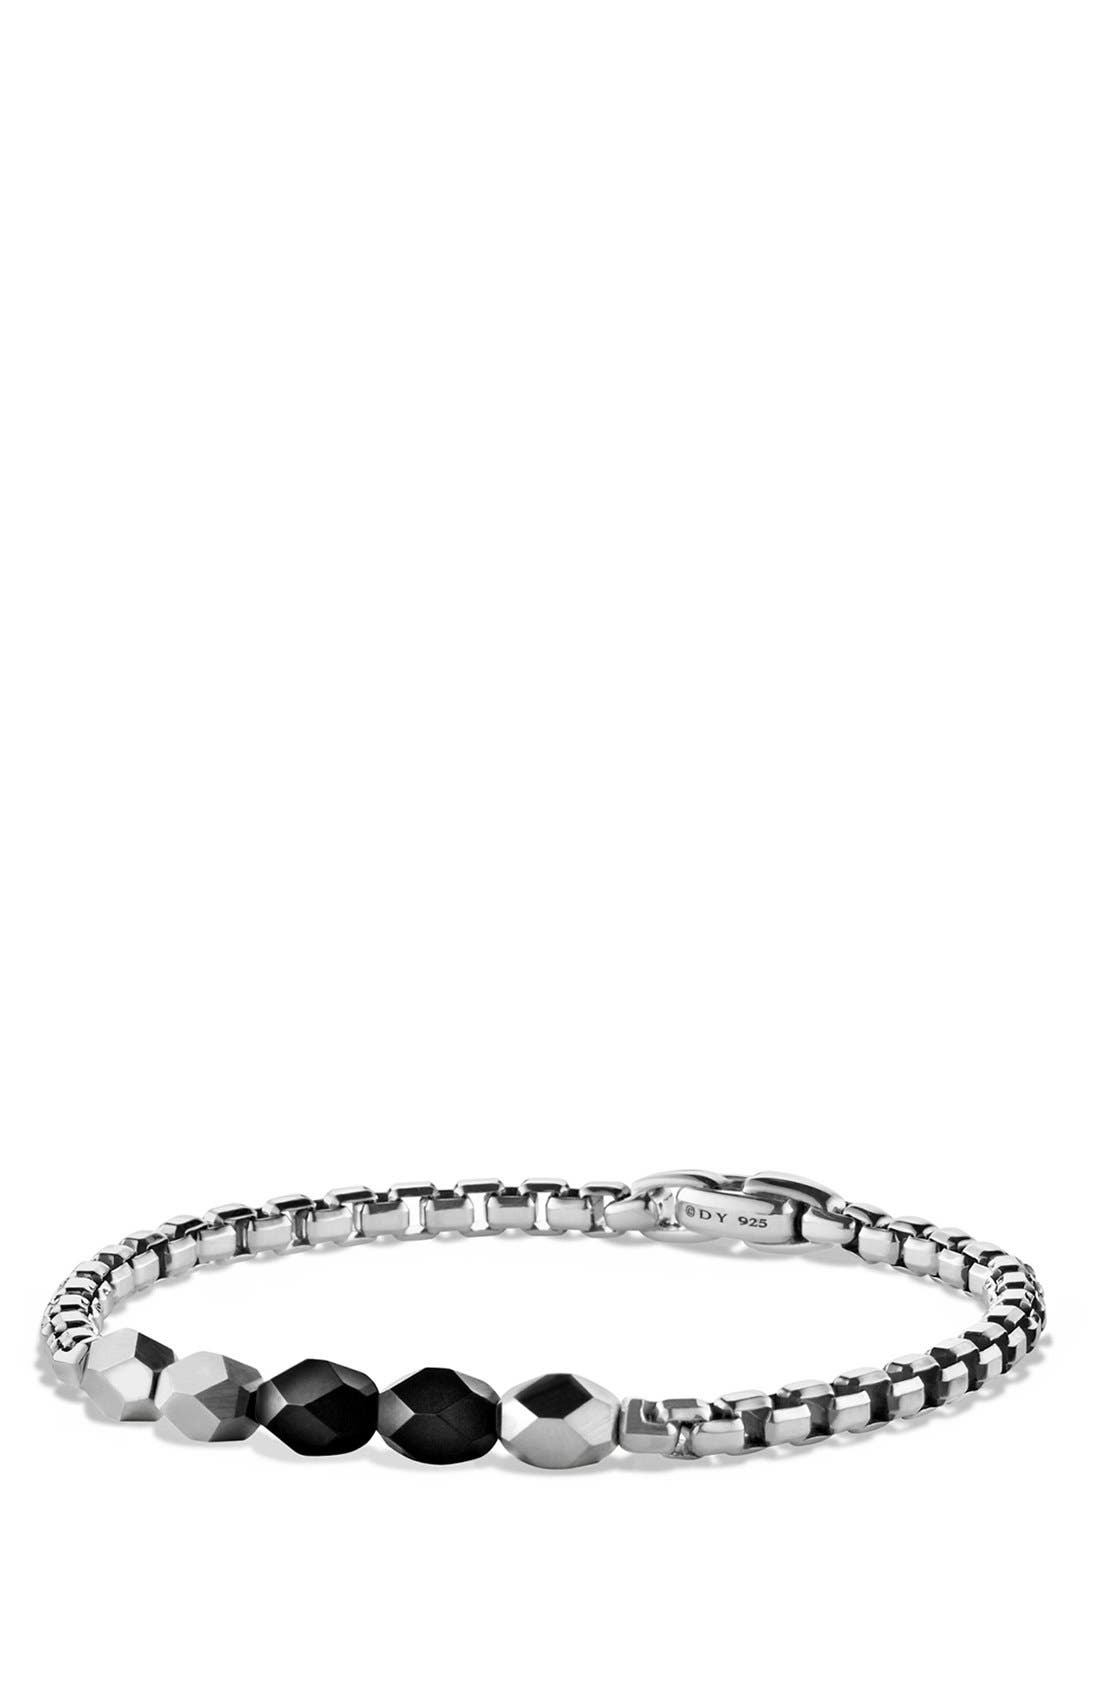 Alternate Image 1 Selected - David Yurman 'Faceted' Metal Bracelet